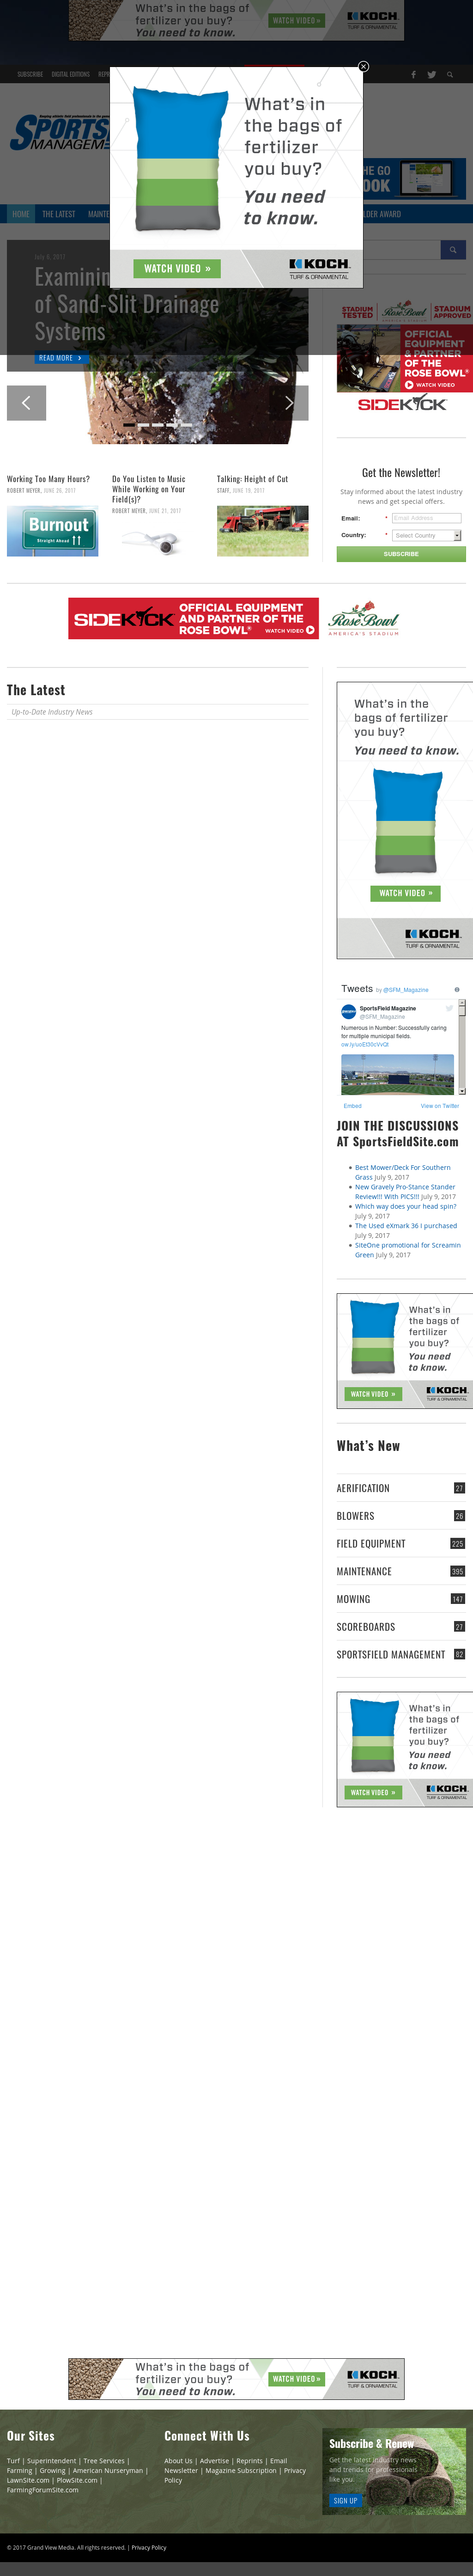 Sportsfield Management Magazine Competitors, Revenue and